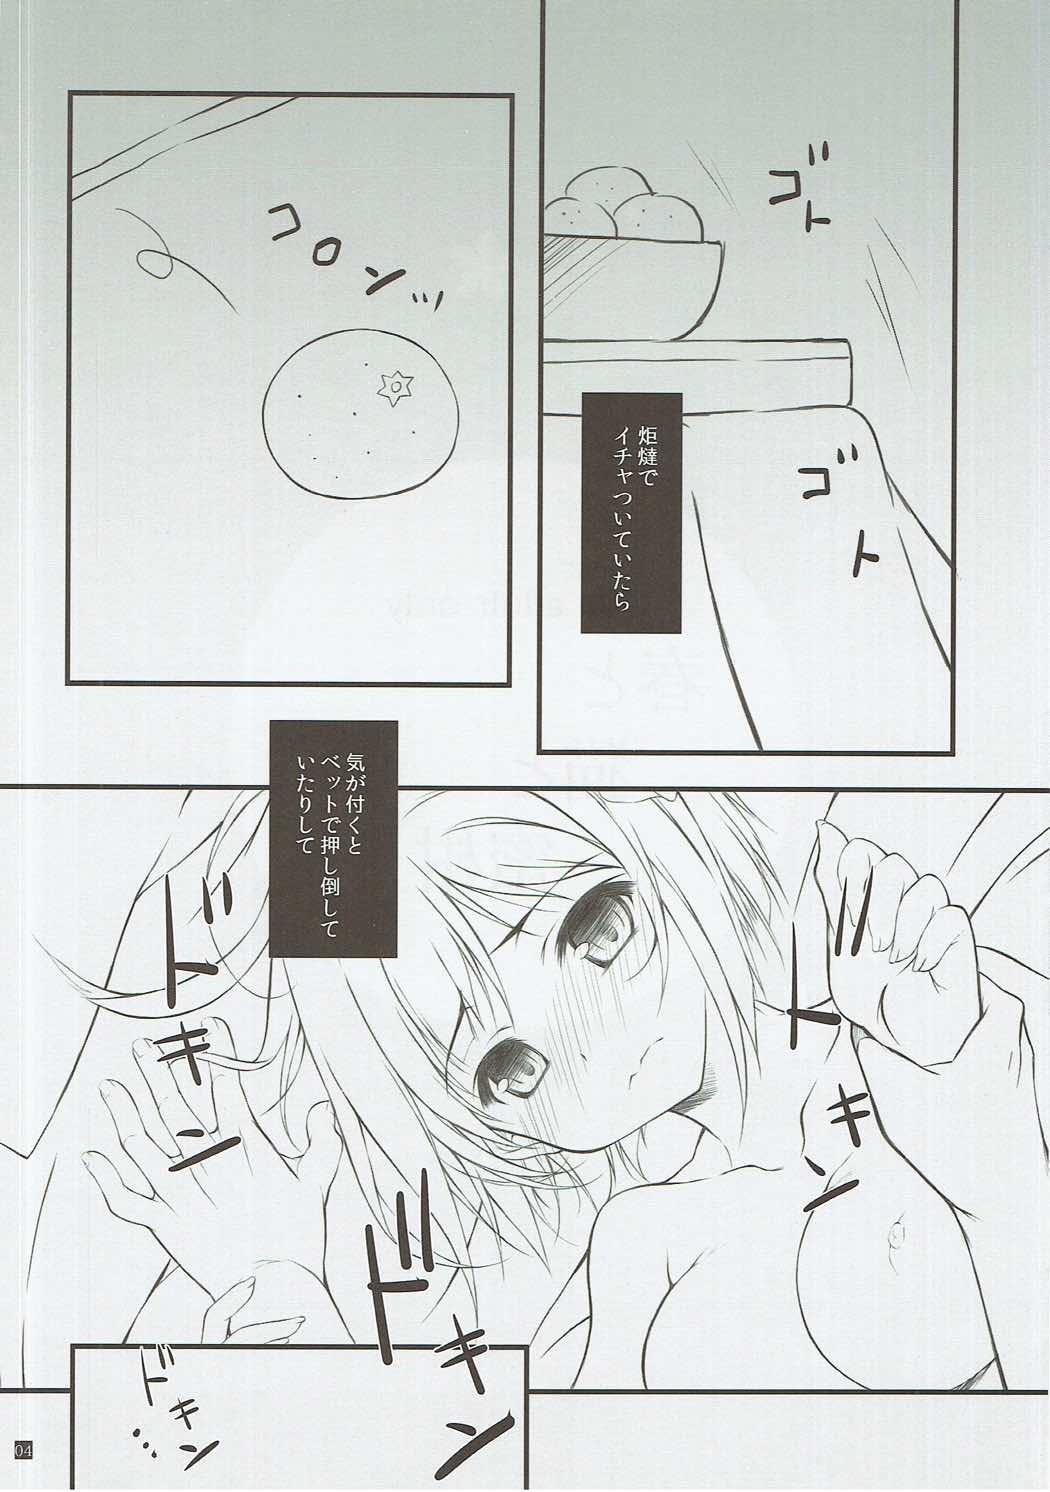 Haru to Neko to Mikan 2